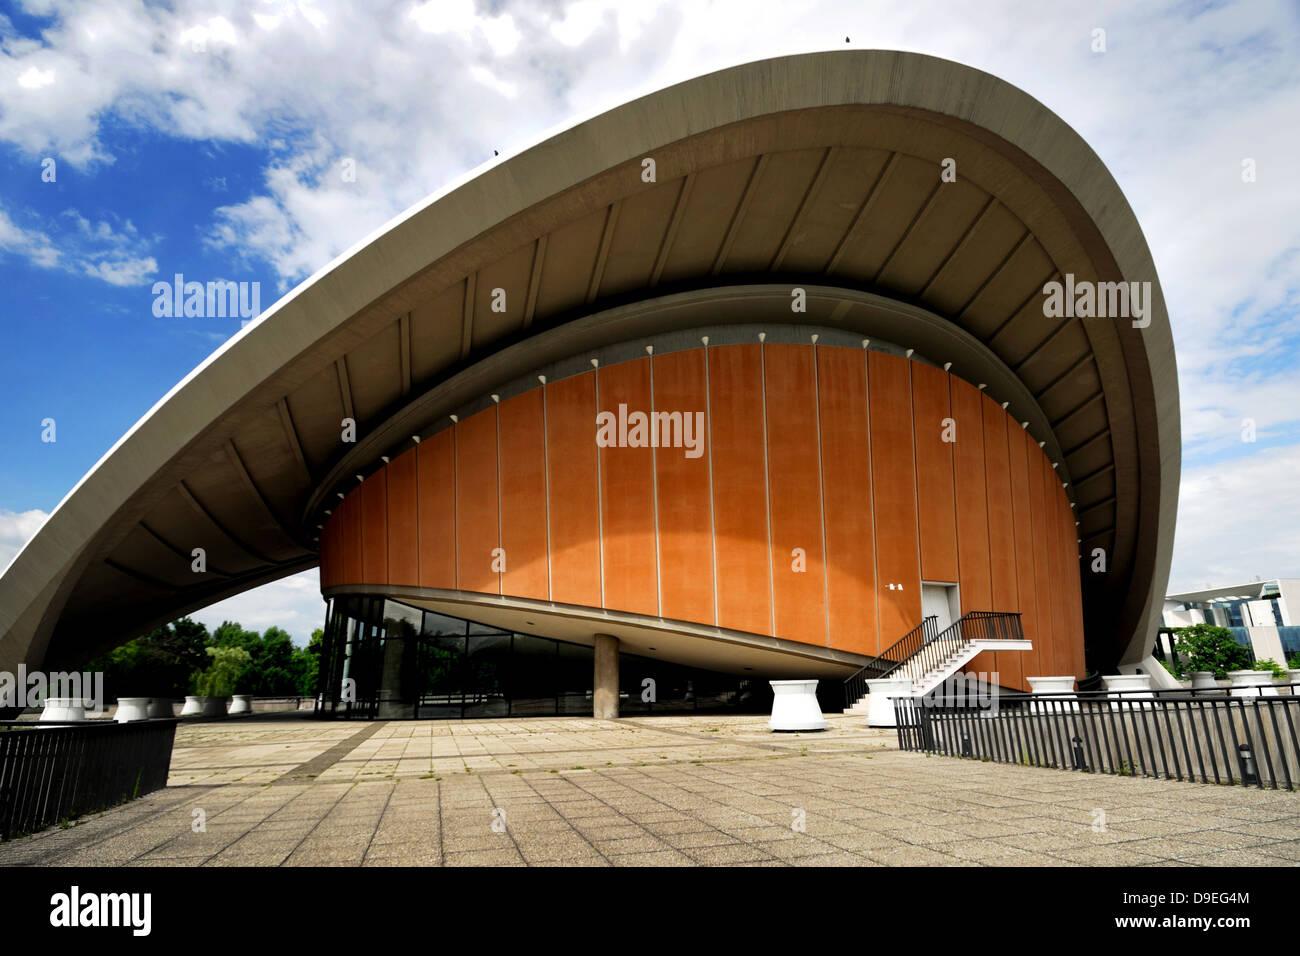 berlin, Haus der Kulturen Welt, Welt House of World Cultures Designed in 1957 by American architect Hugh Stubbins - Stock Image